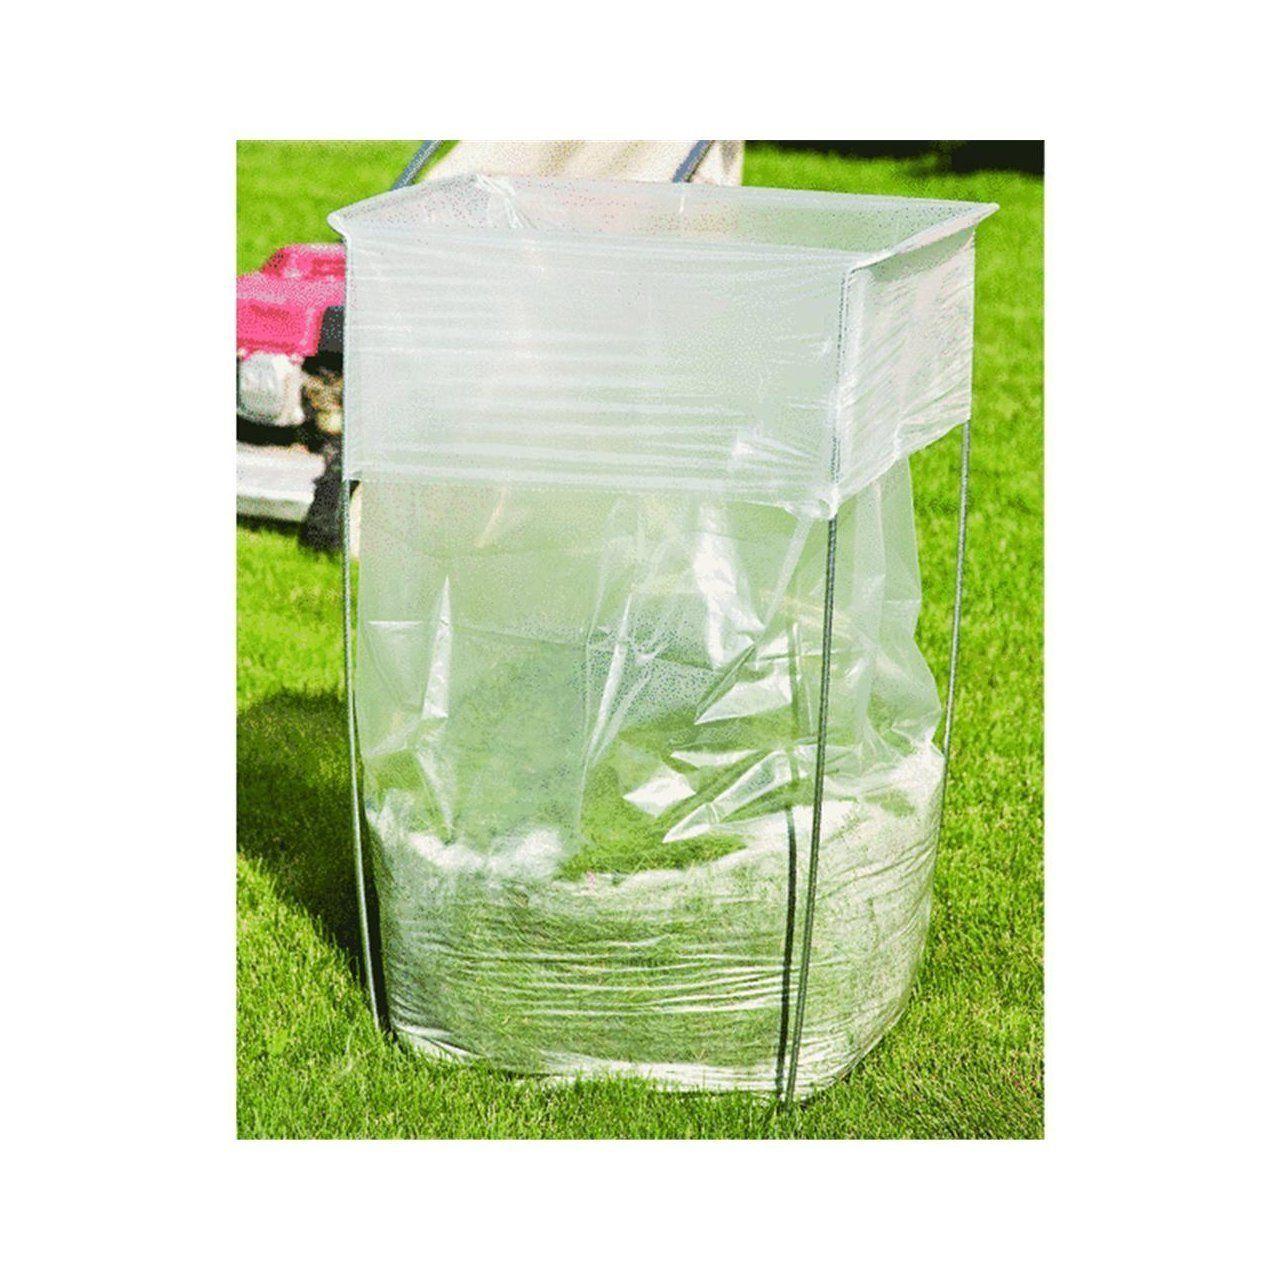 Elegant Trash Bag Holder   Multi Use Bag Buddy Support Stand   45 Gallon Bags)  (Discontinued By Manufacturer)